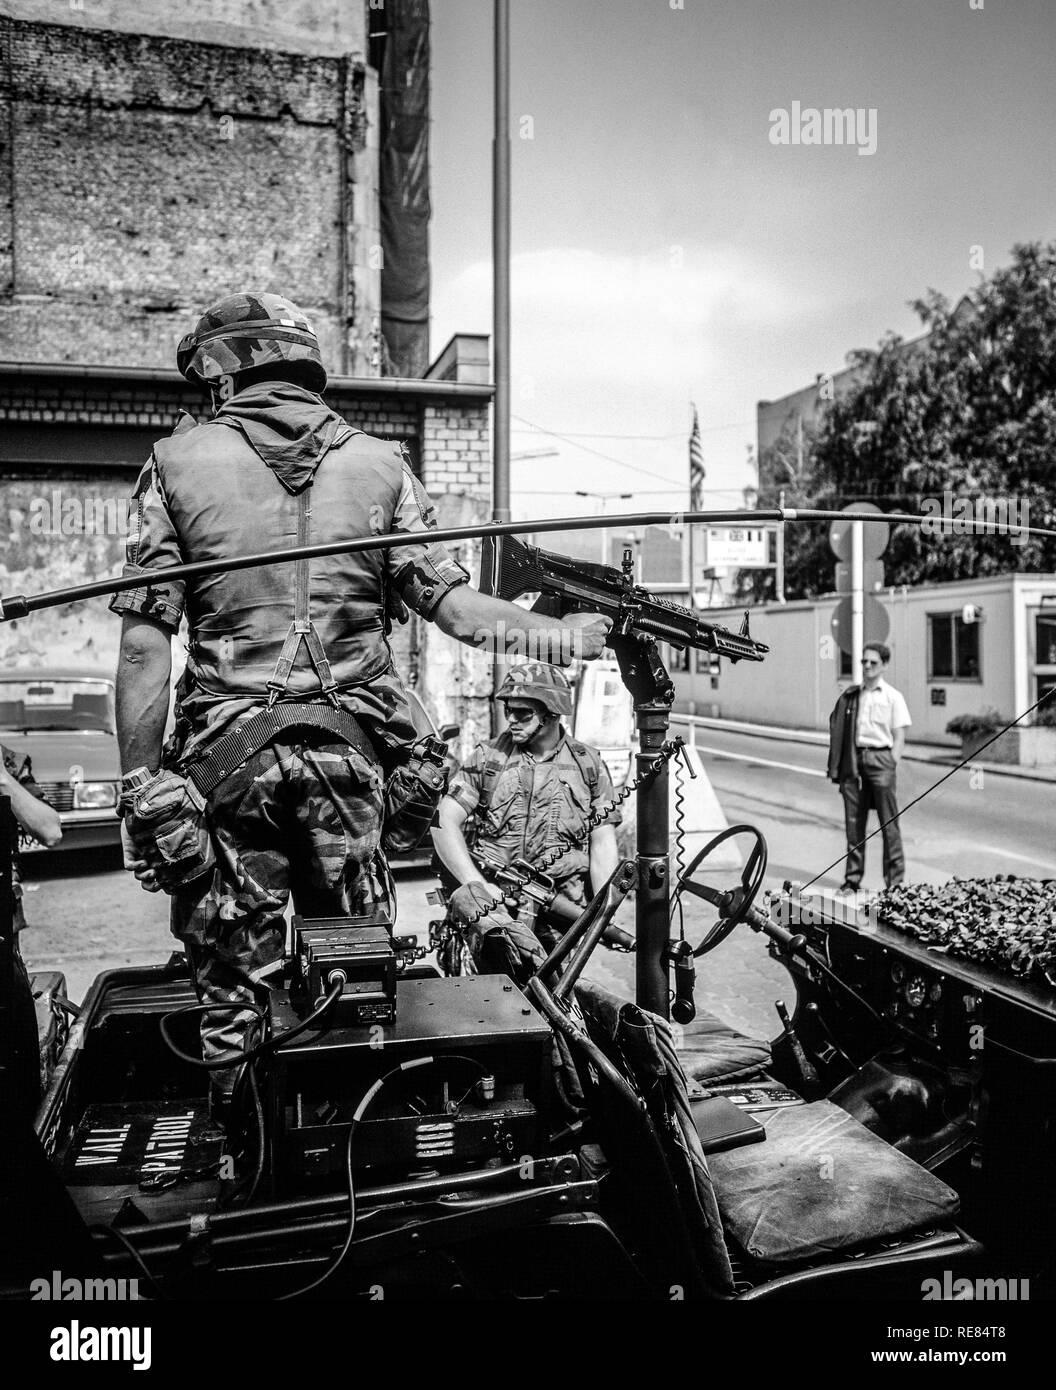 Agosto de 1986, Berlín, el ejército estadounidense patrulla de pared en Allied Checkpoint Charlie, la calle Friedrichstrasse, Kreuzberg, Berlín occidental, Alemania, Europa, Imagen De Stock